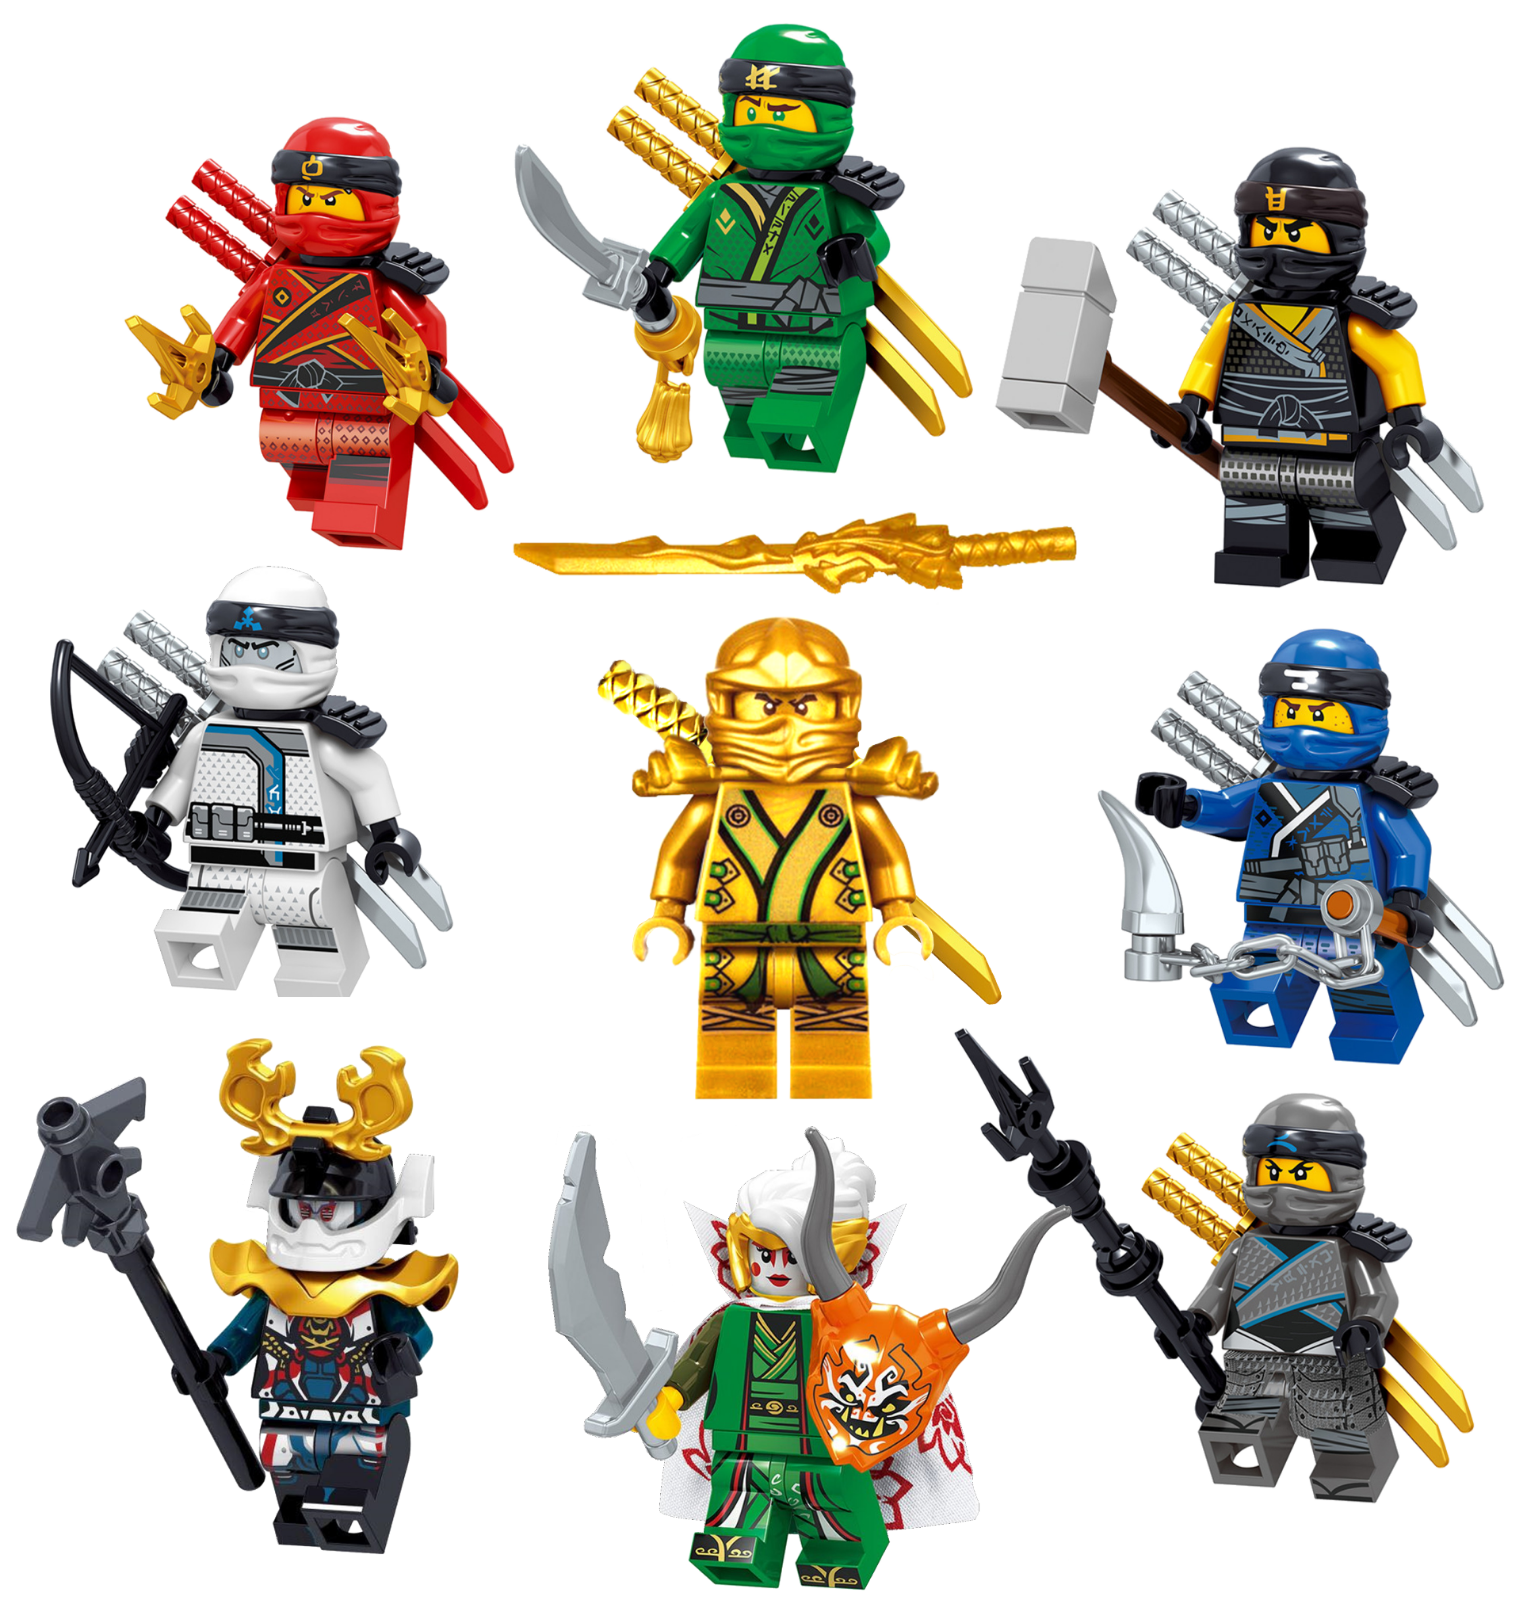 Lego Ninjago Figur Nya /& Zane Minifiguren